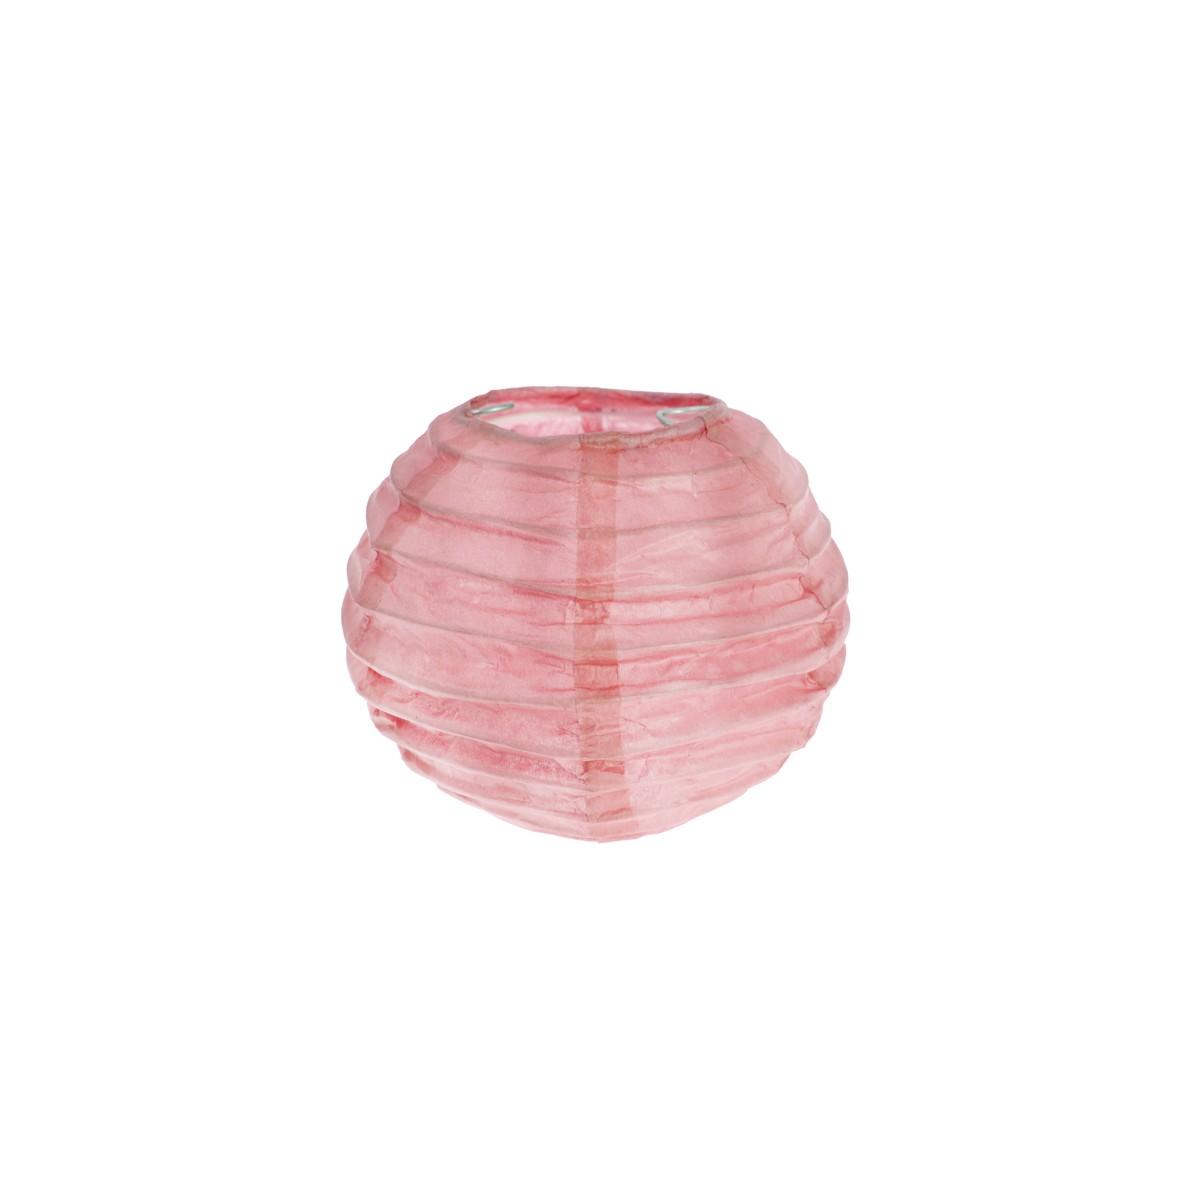 2x Mini lanterne Papier 7.5cm - Rose